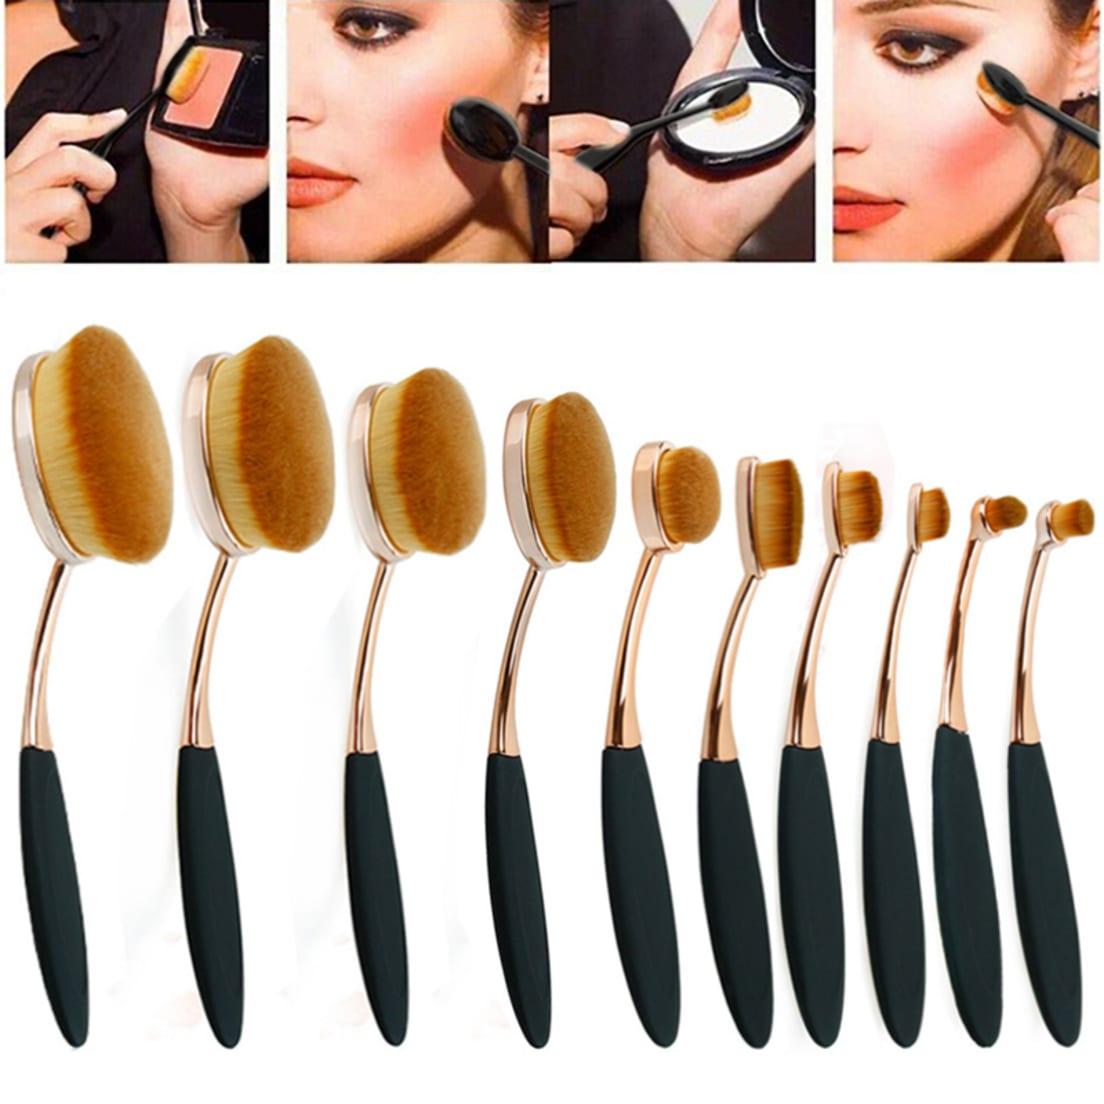 5523da6951 Zoë Ayla 10-Piece Professional Oval Makeup Brush Set